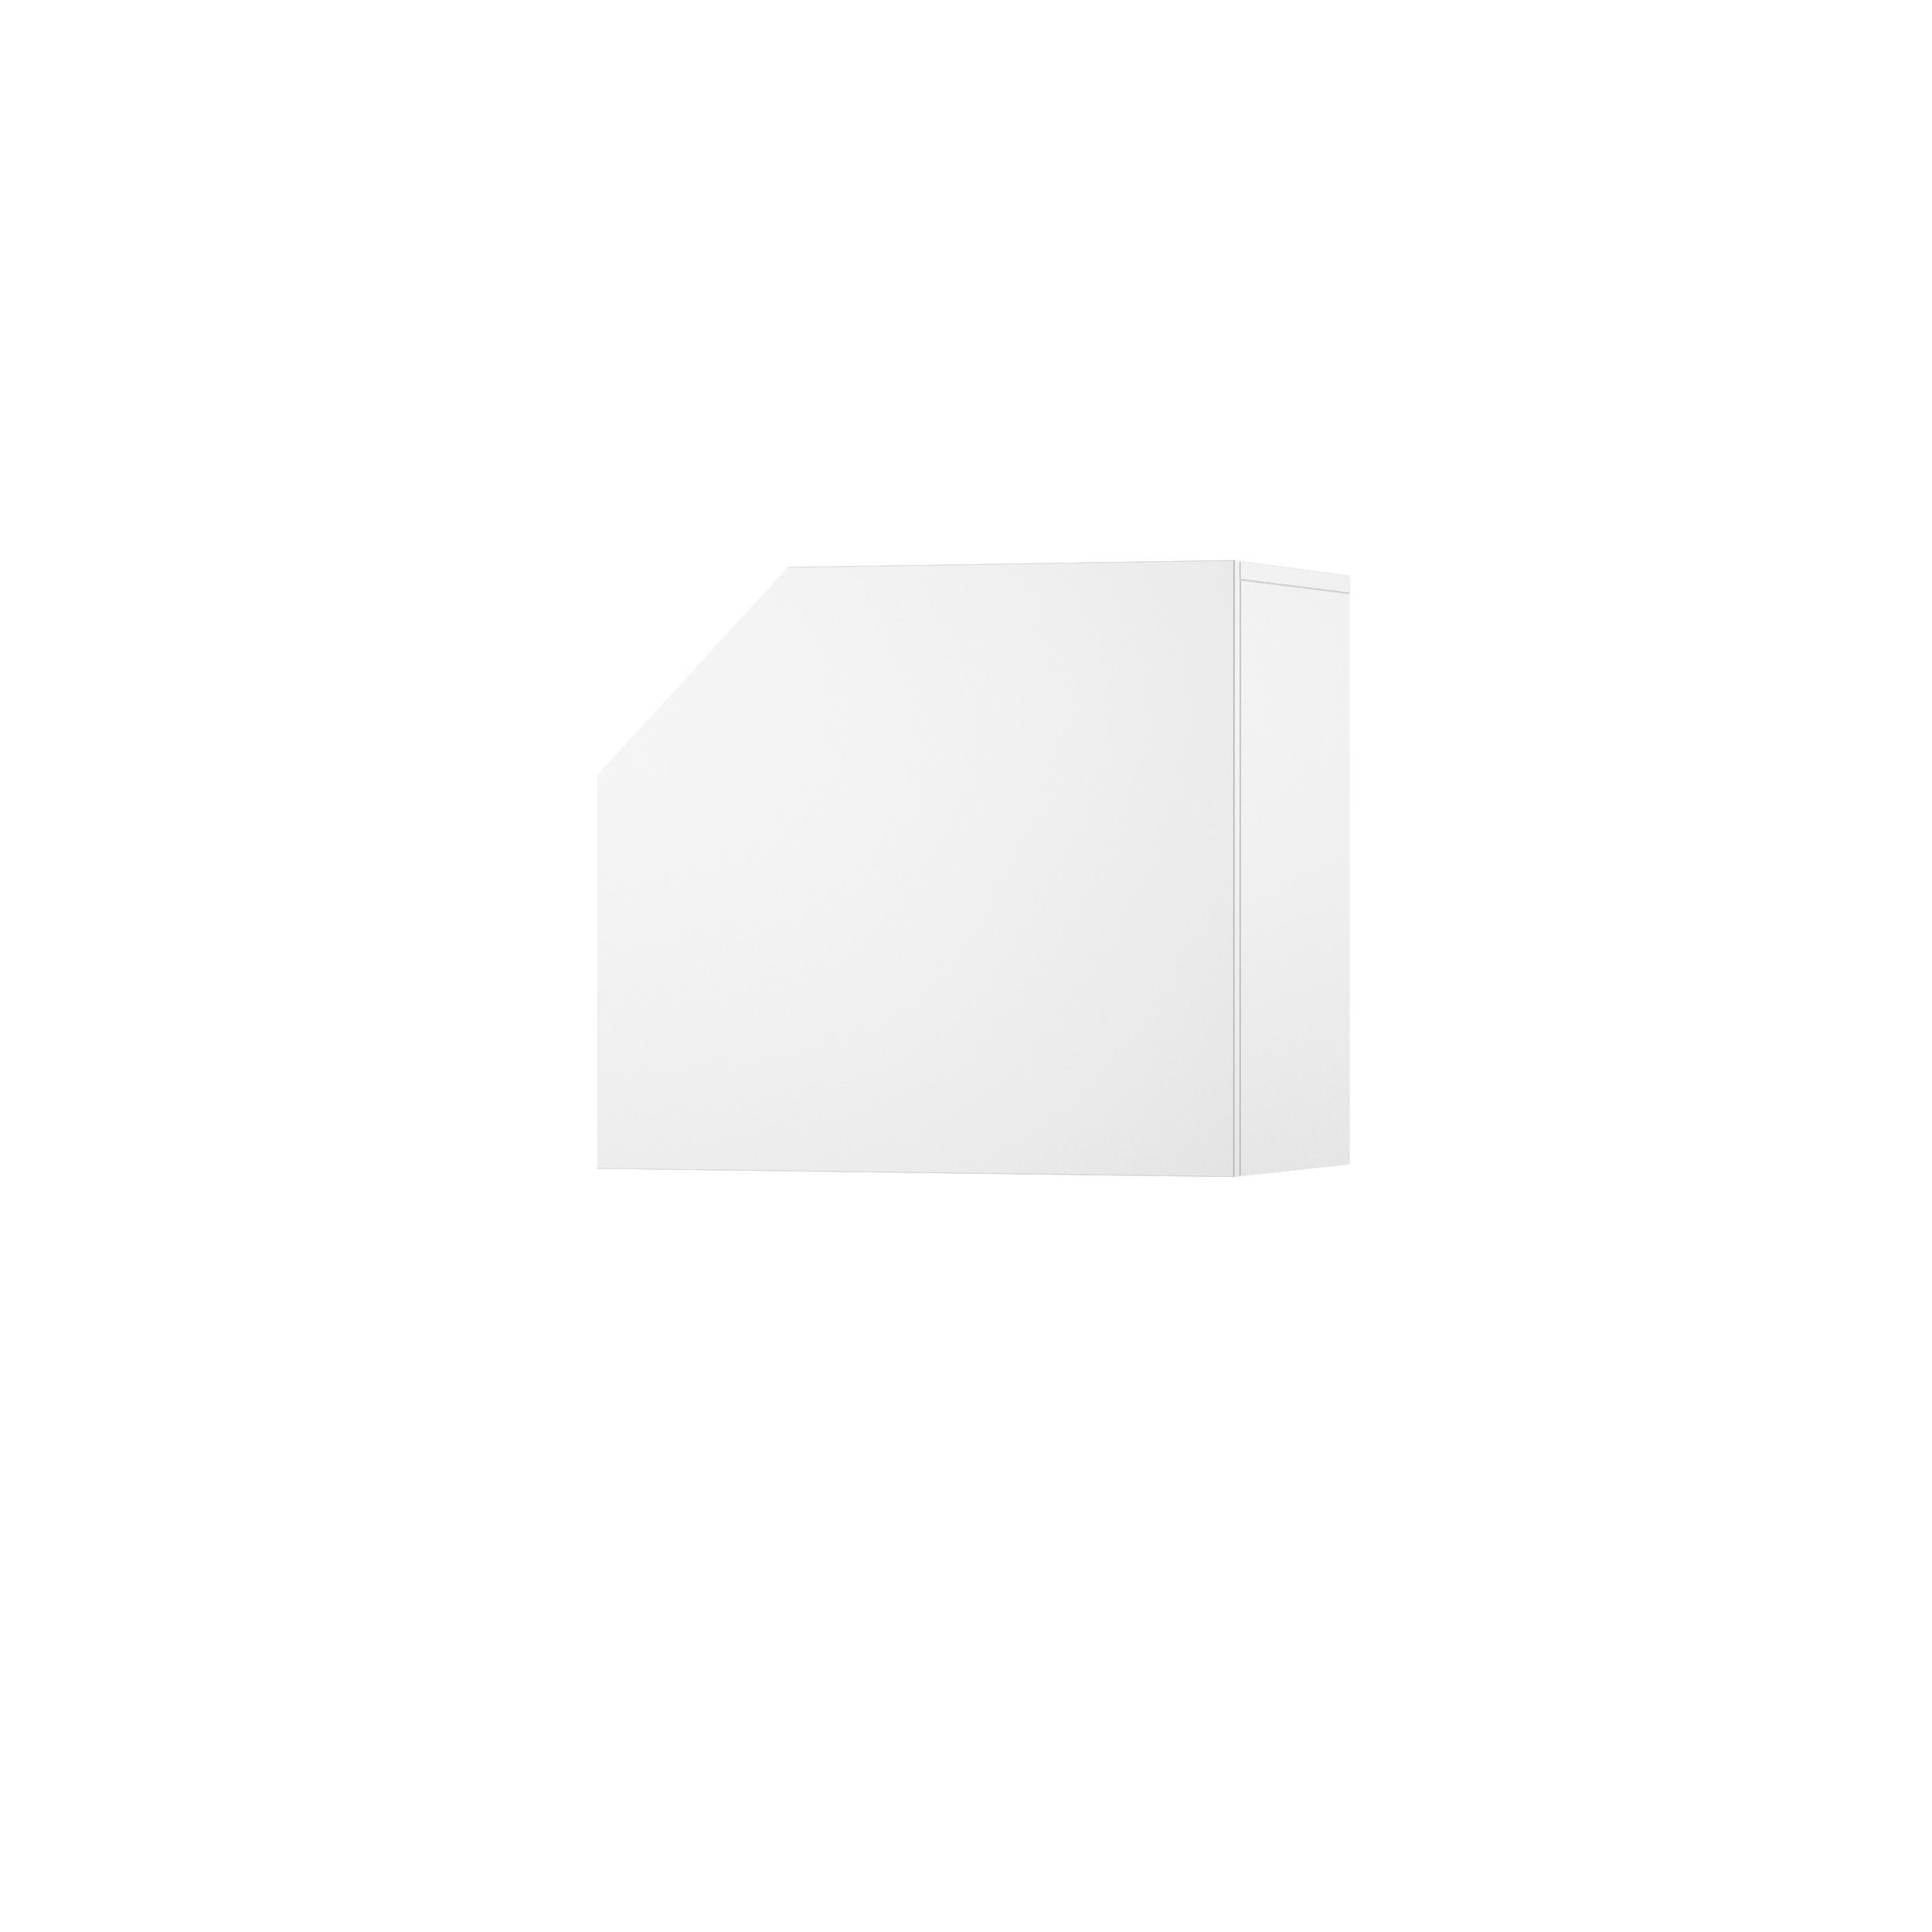 Dulap Modular Stanga Alb - 6672